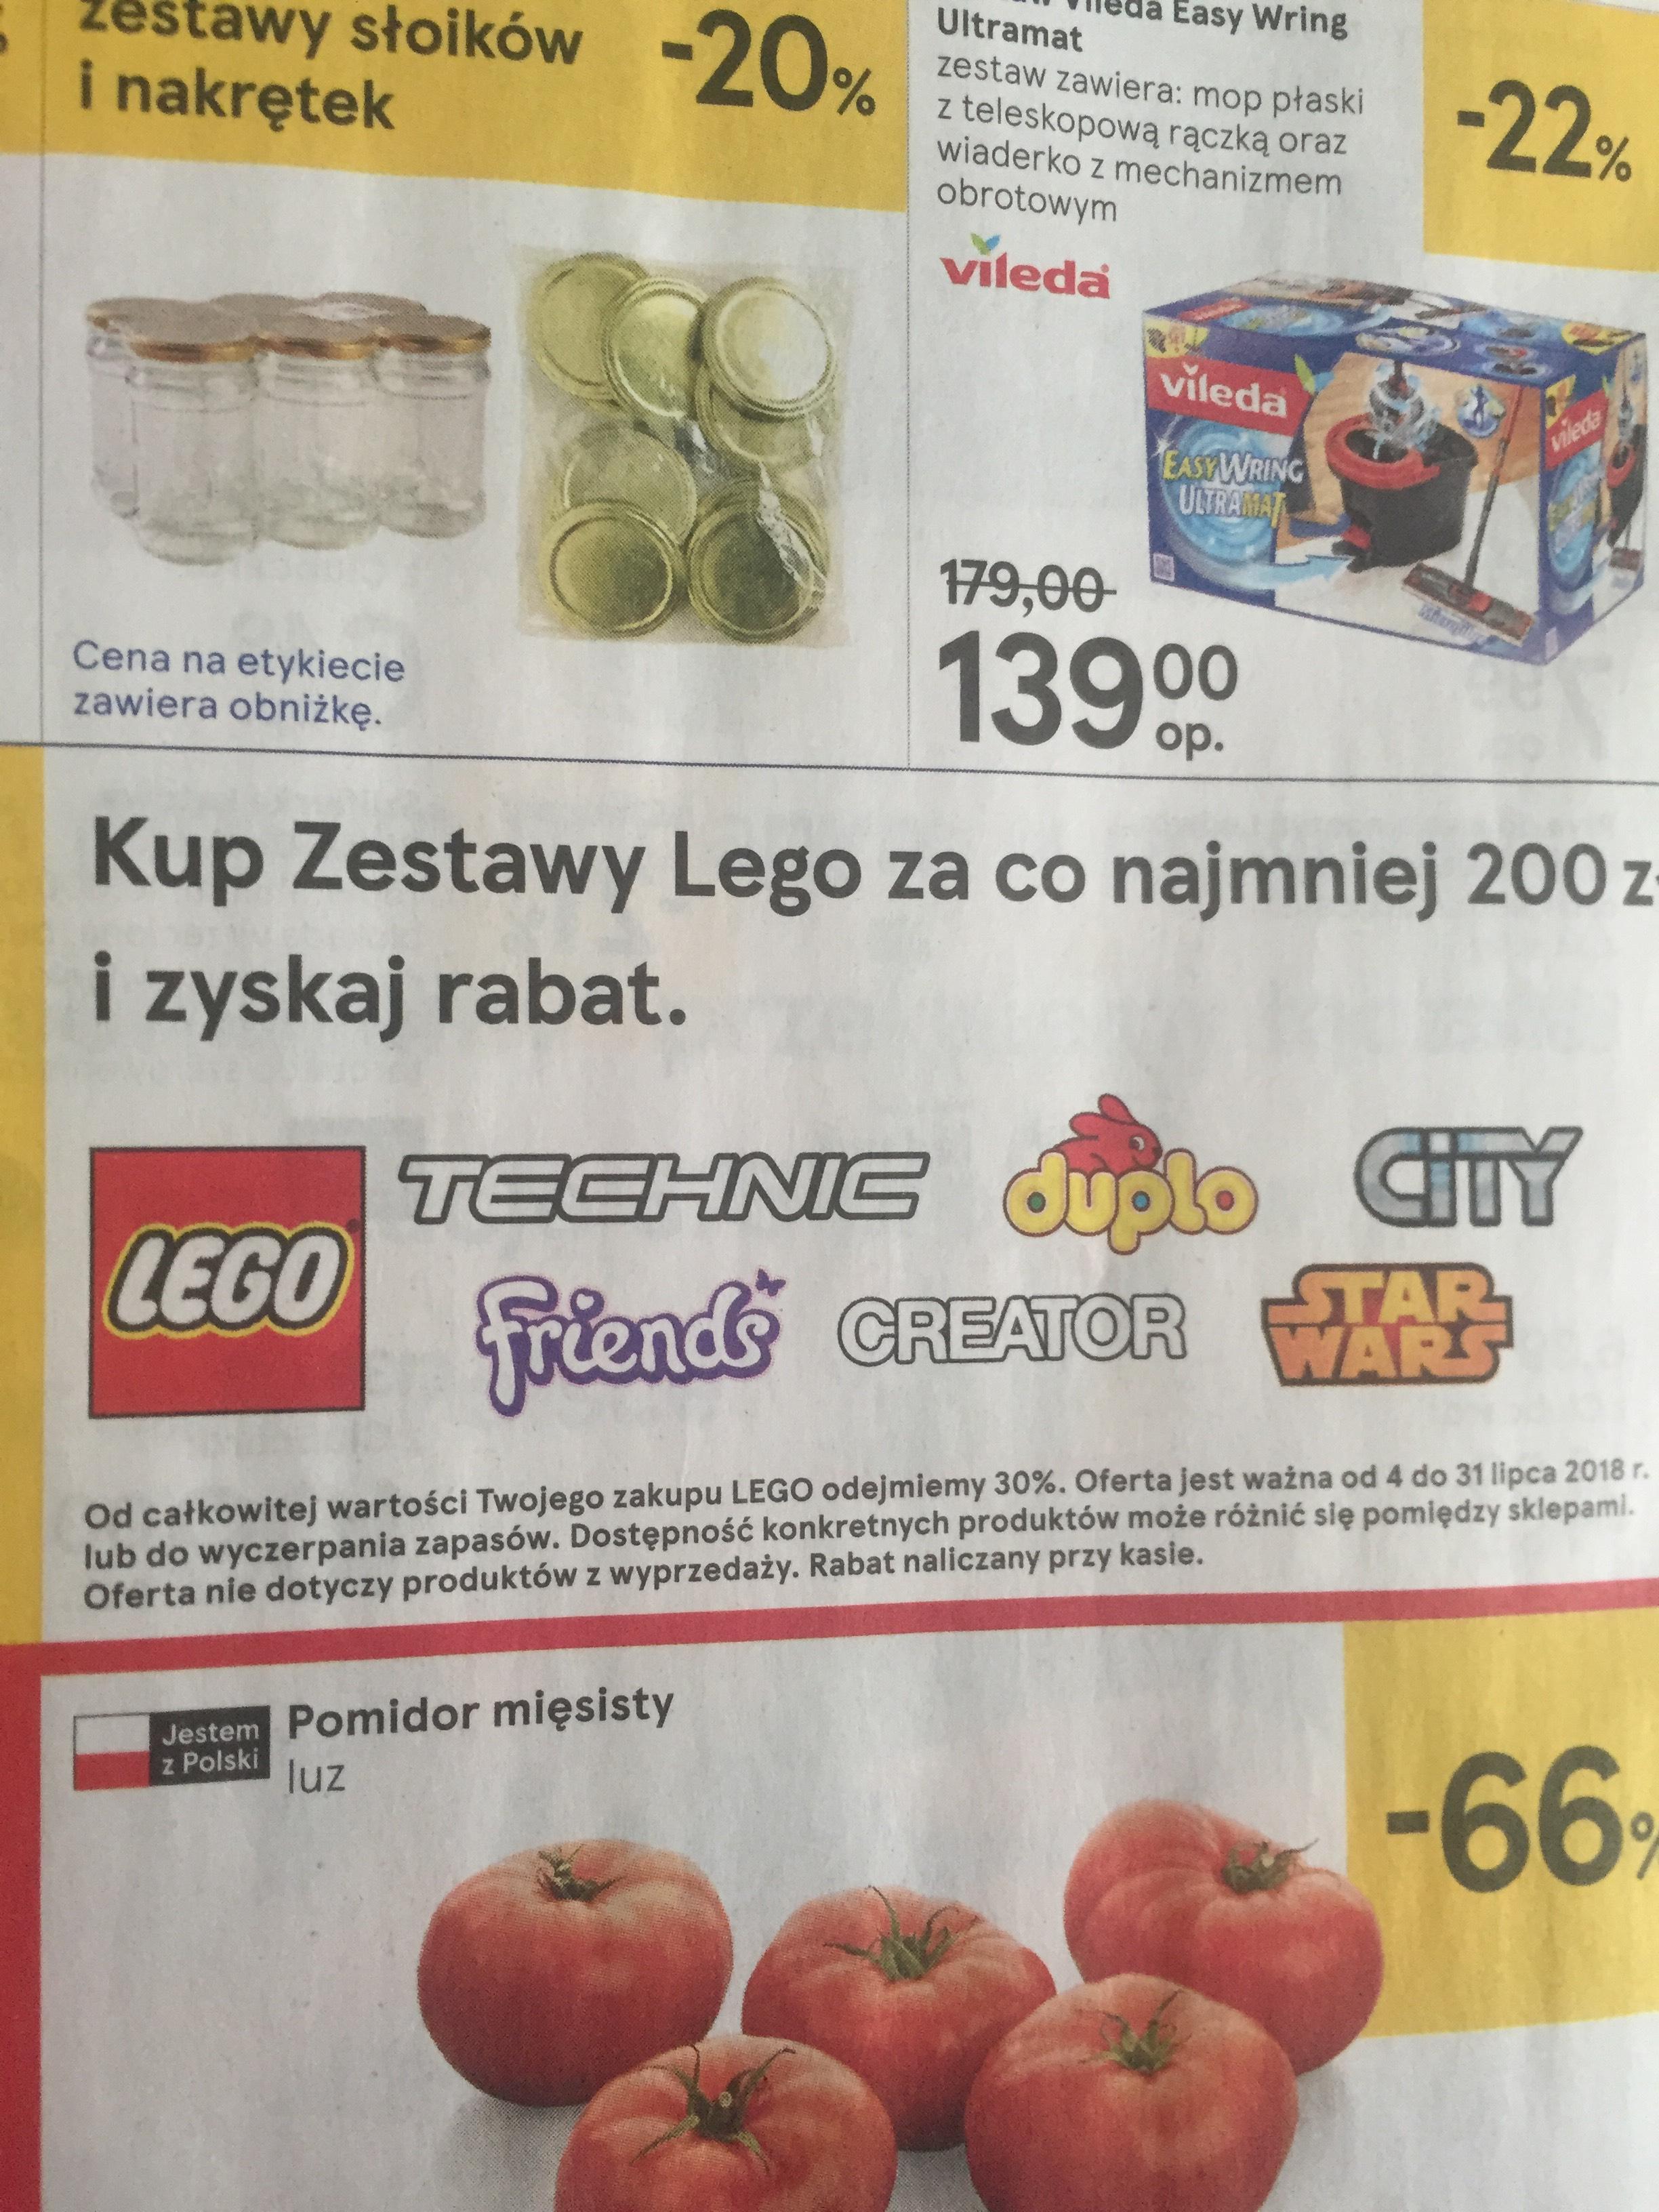 30% rabatu na Lego mwz 200zł @tesco